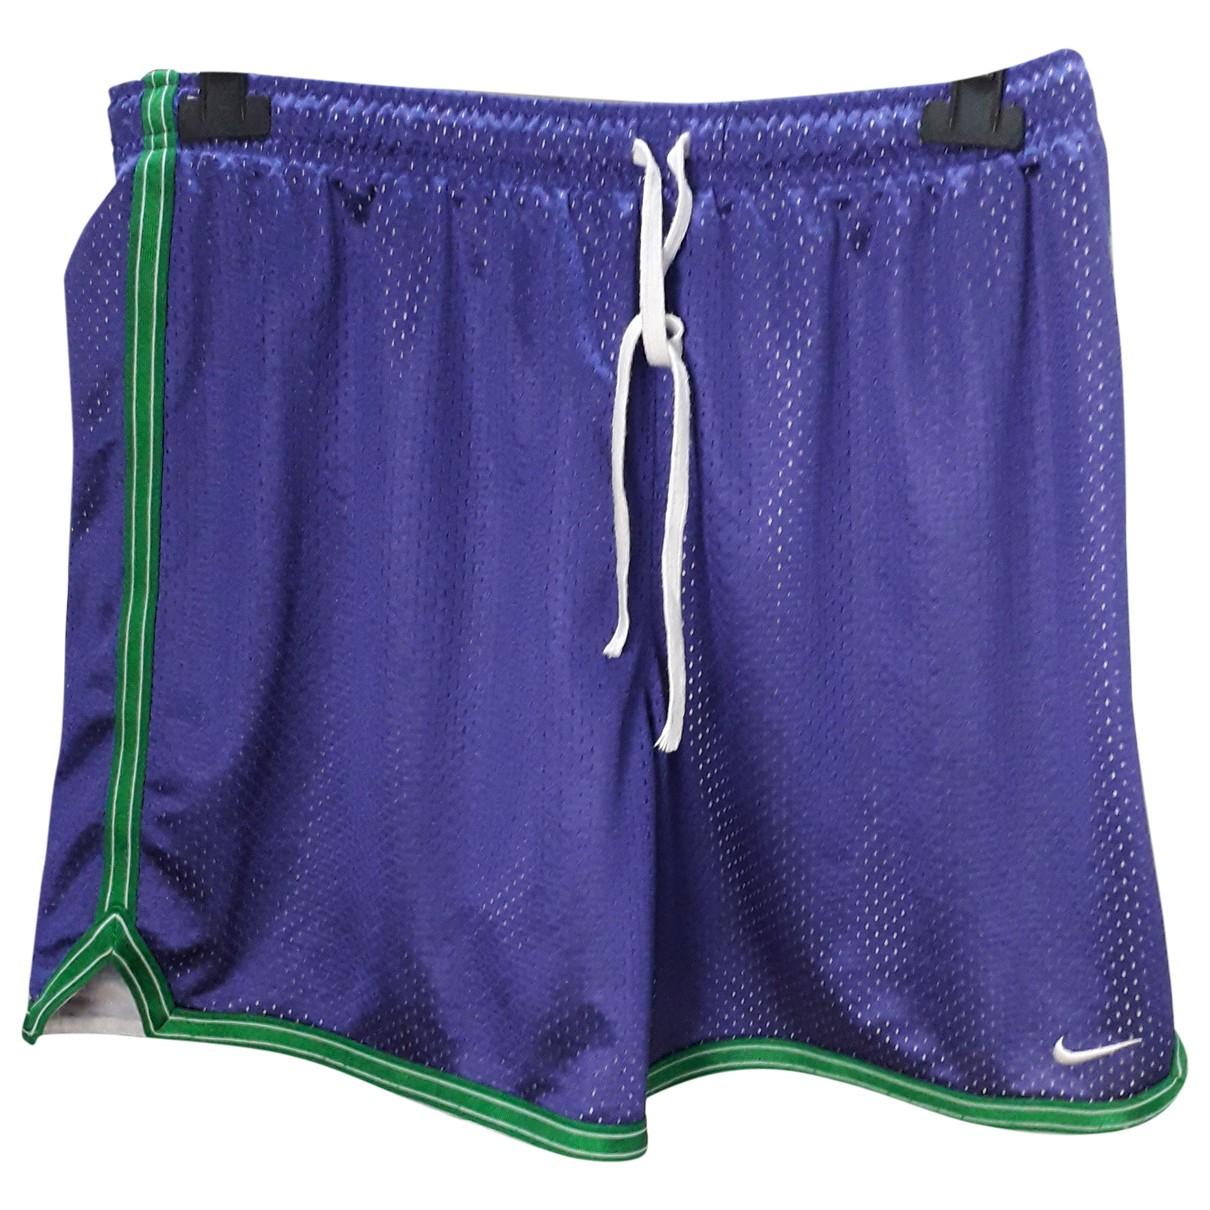 Nike \N Shorts in  Lila Synthetik